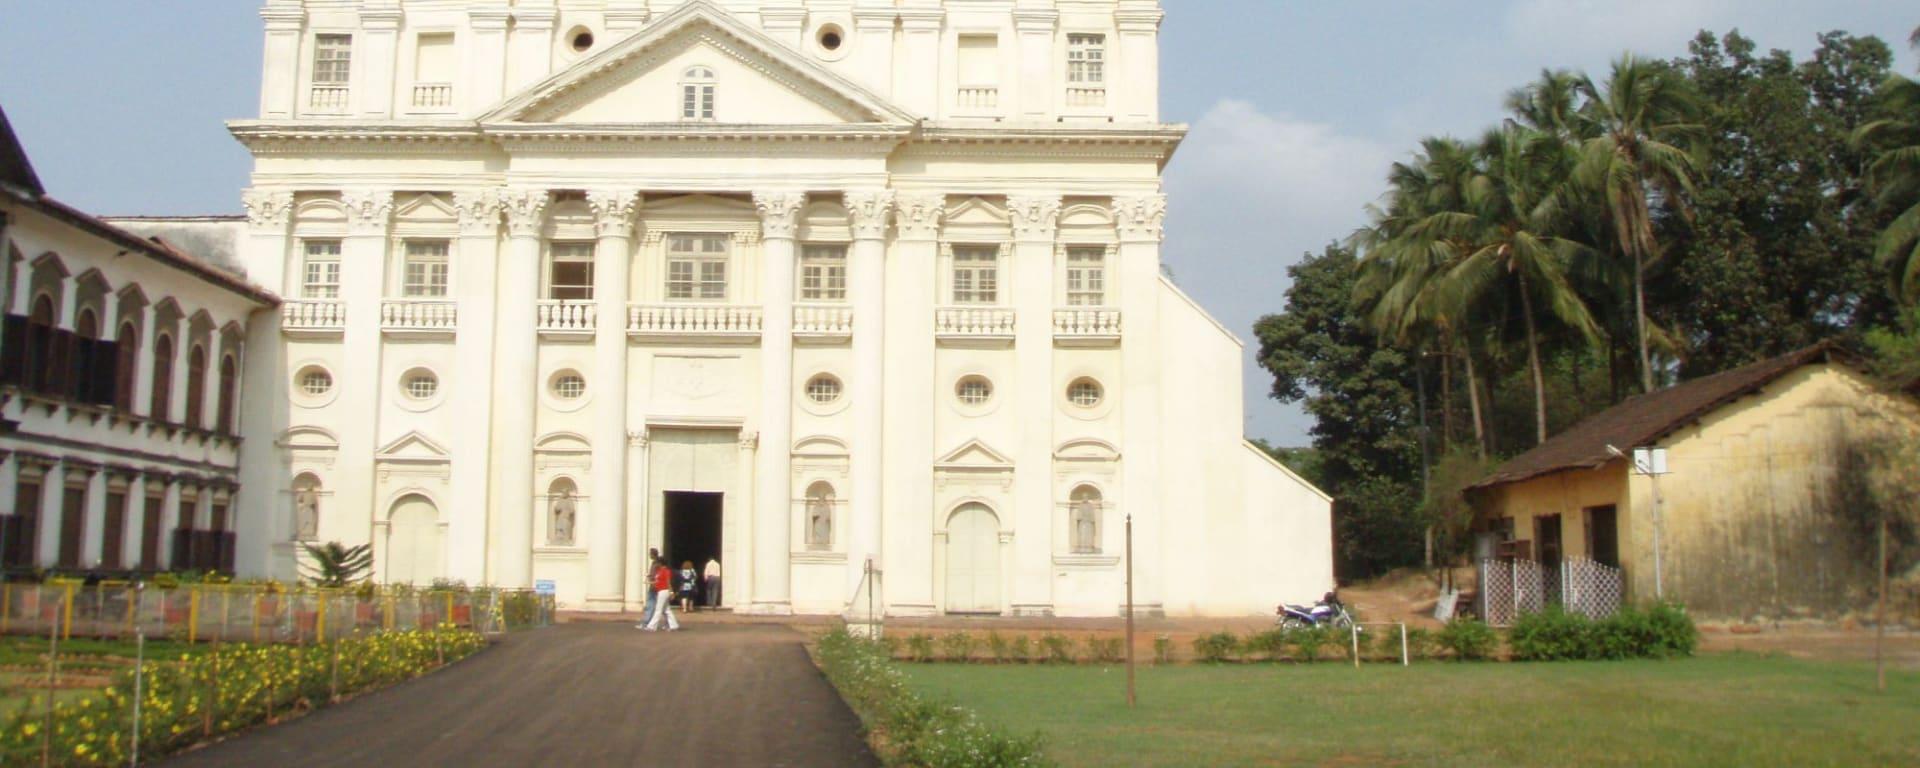 Das koloniale Erbe Goas: Cathedral